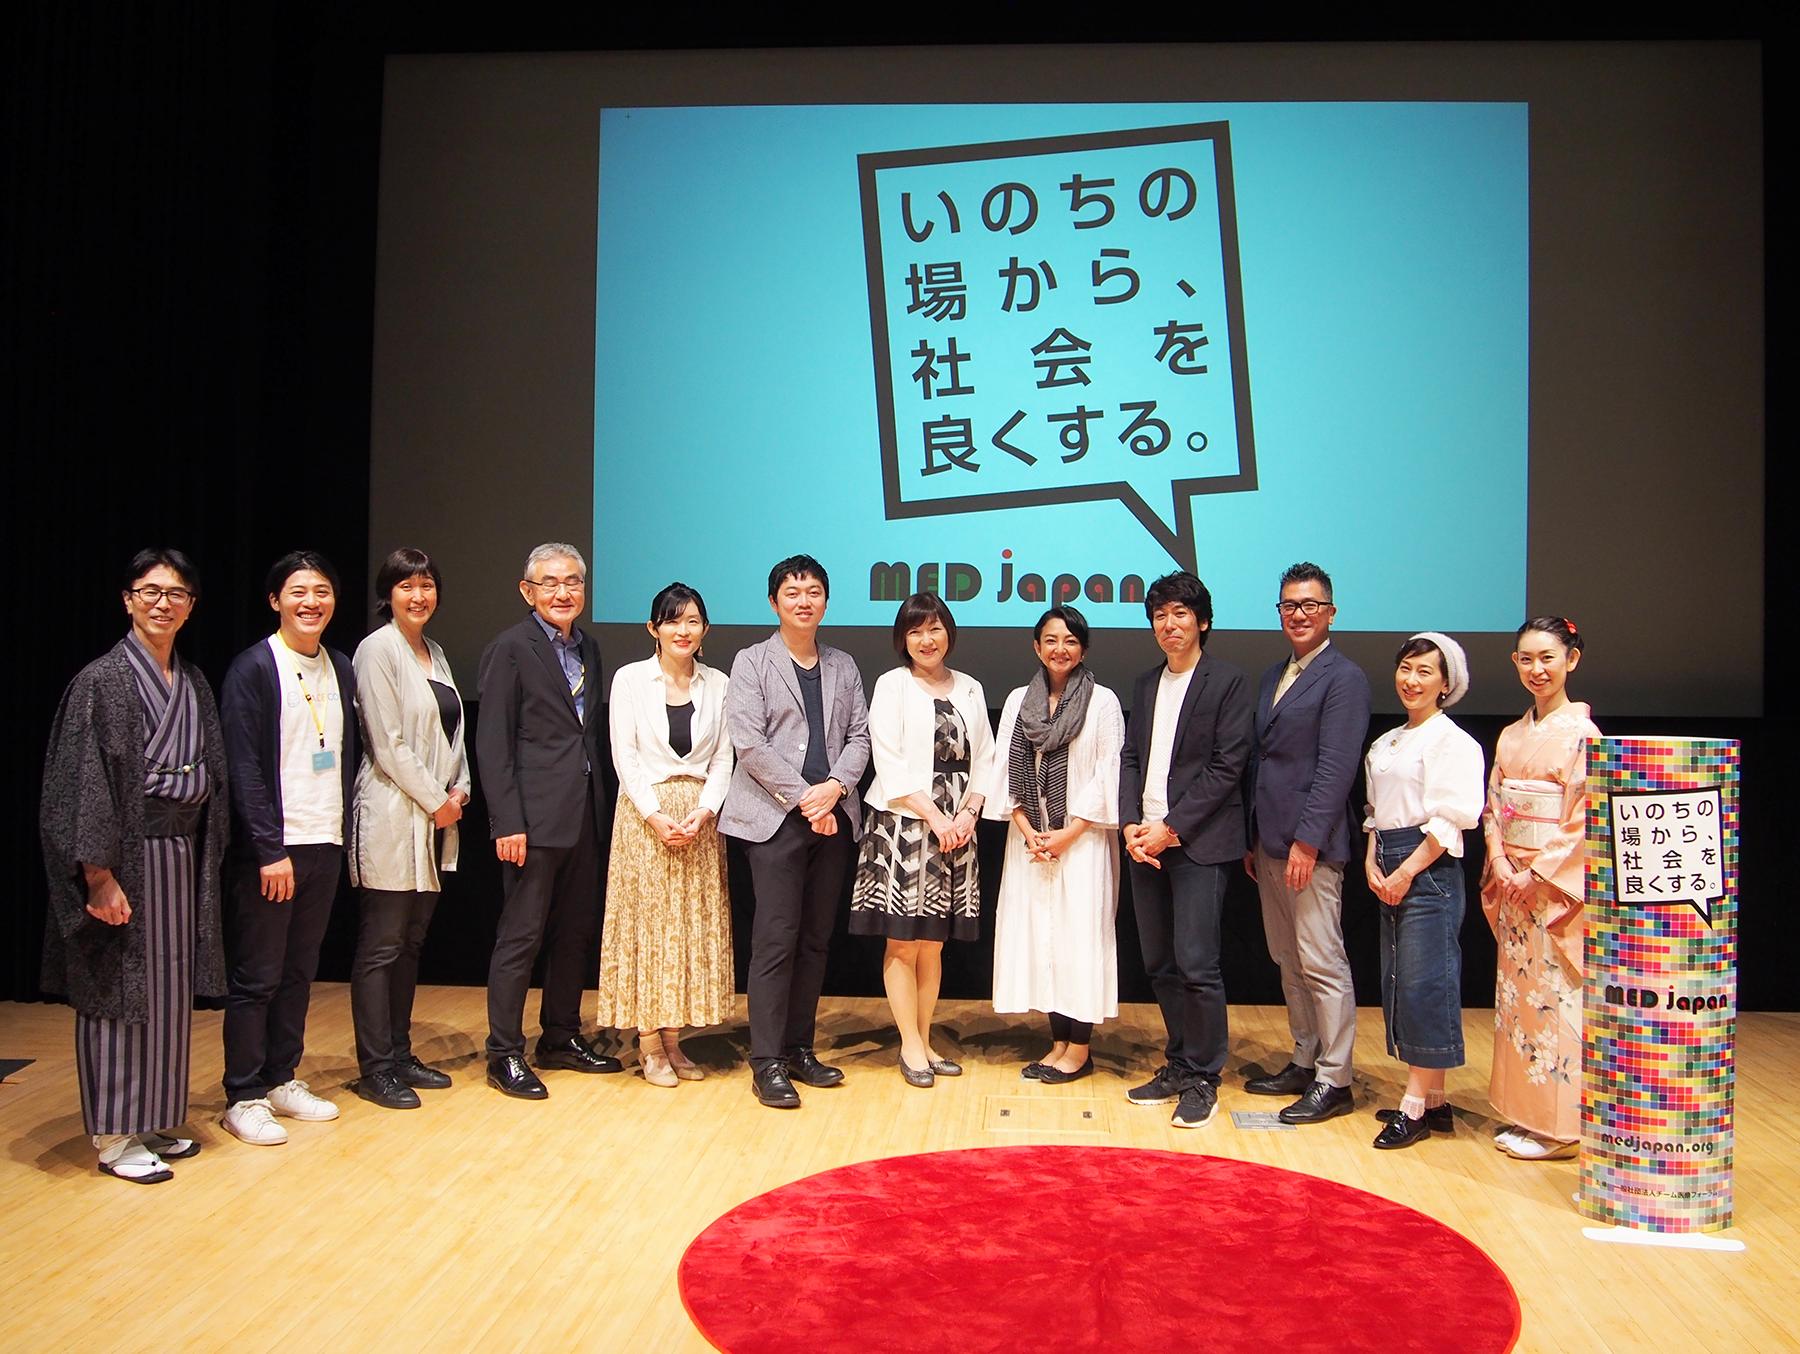 MED Japan 2019メインプレゼンター